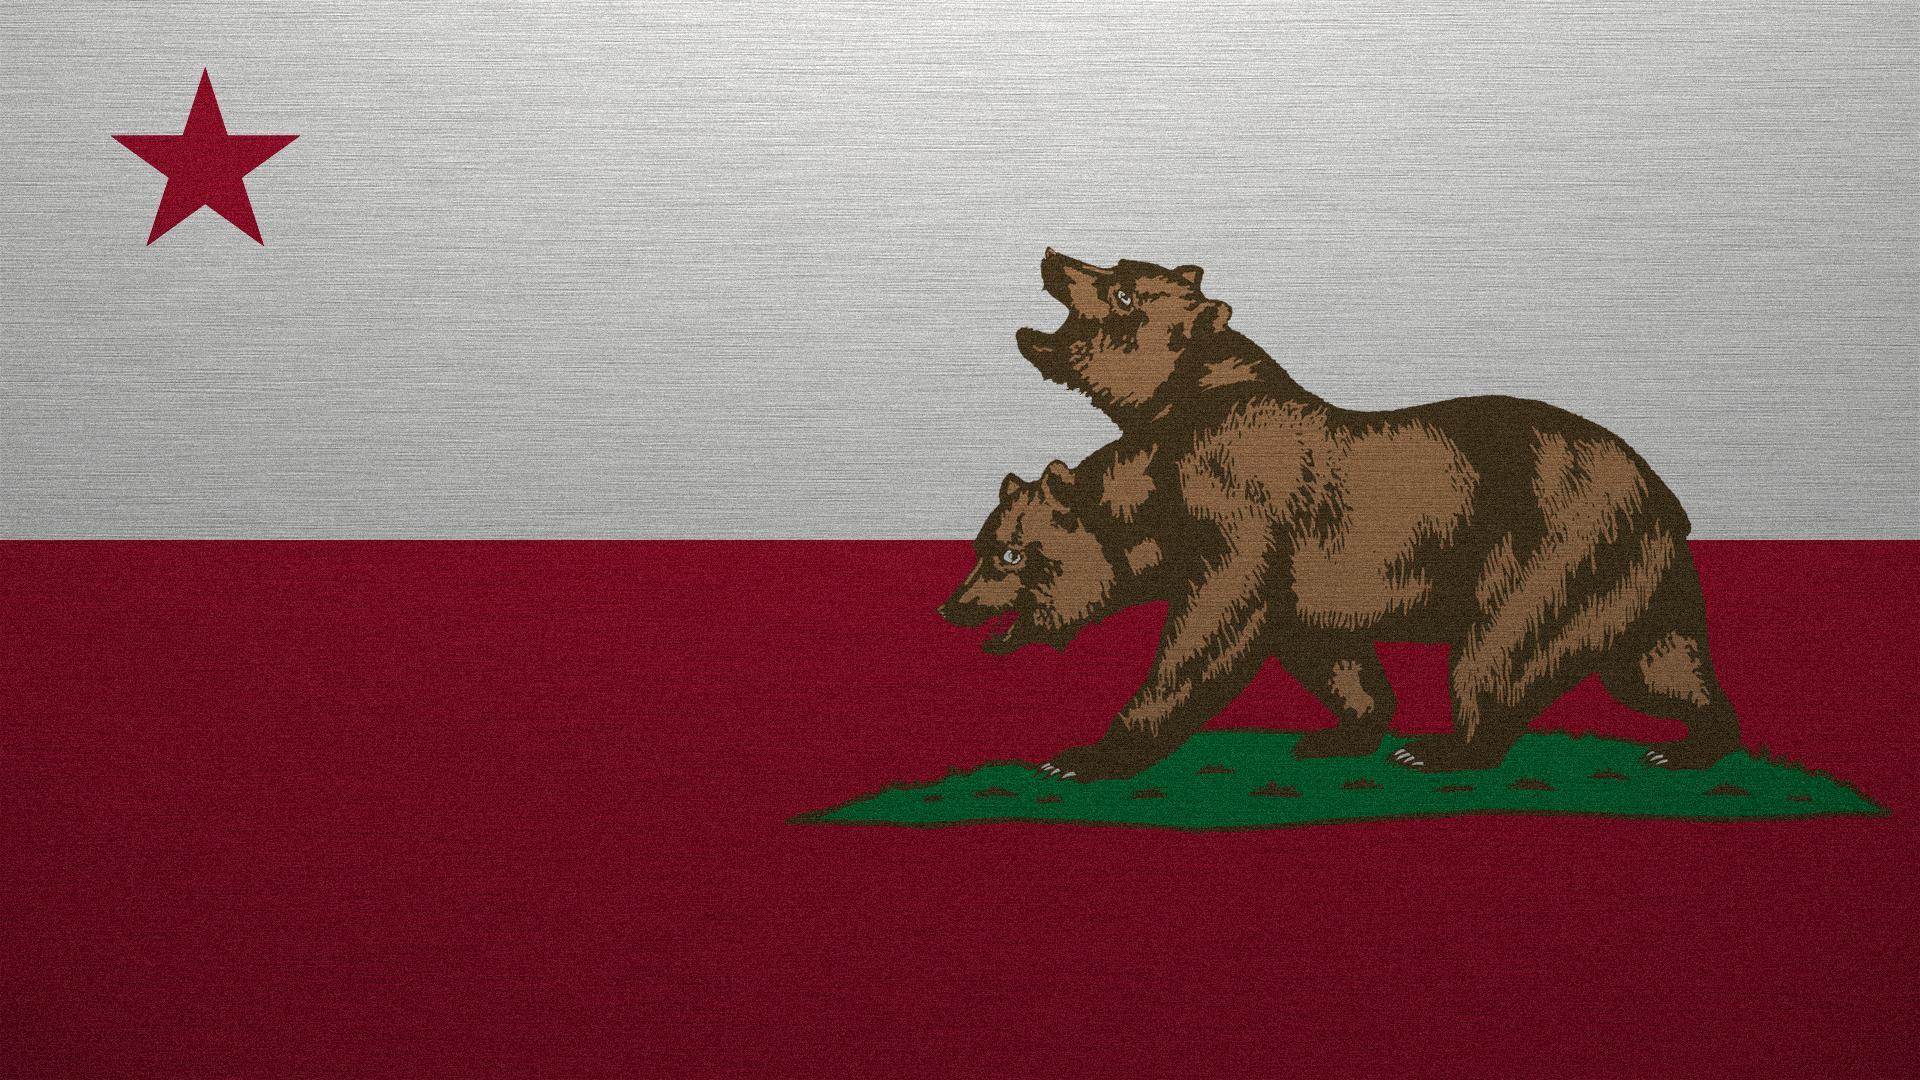 NCR Flag Wallpaper Fallout